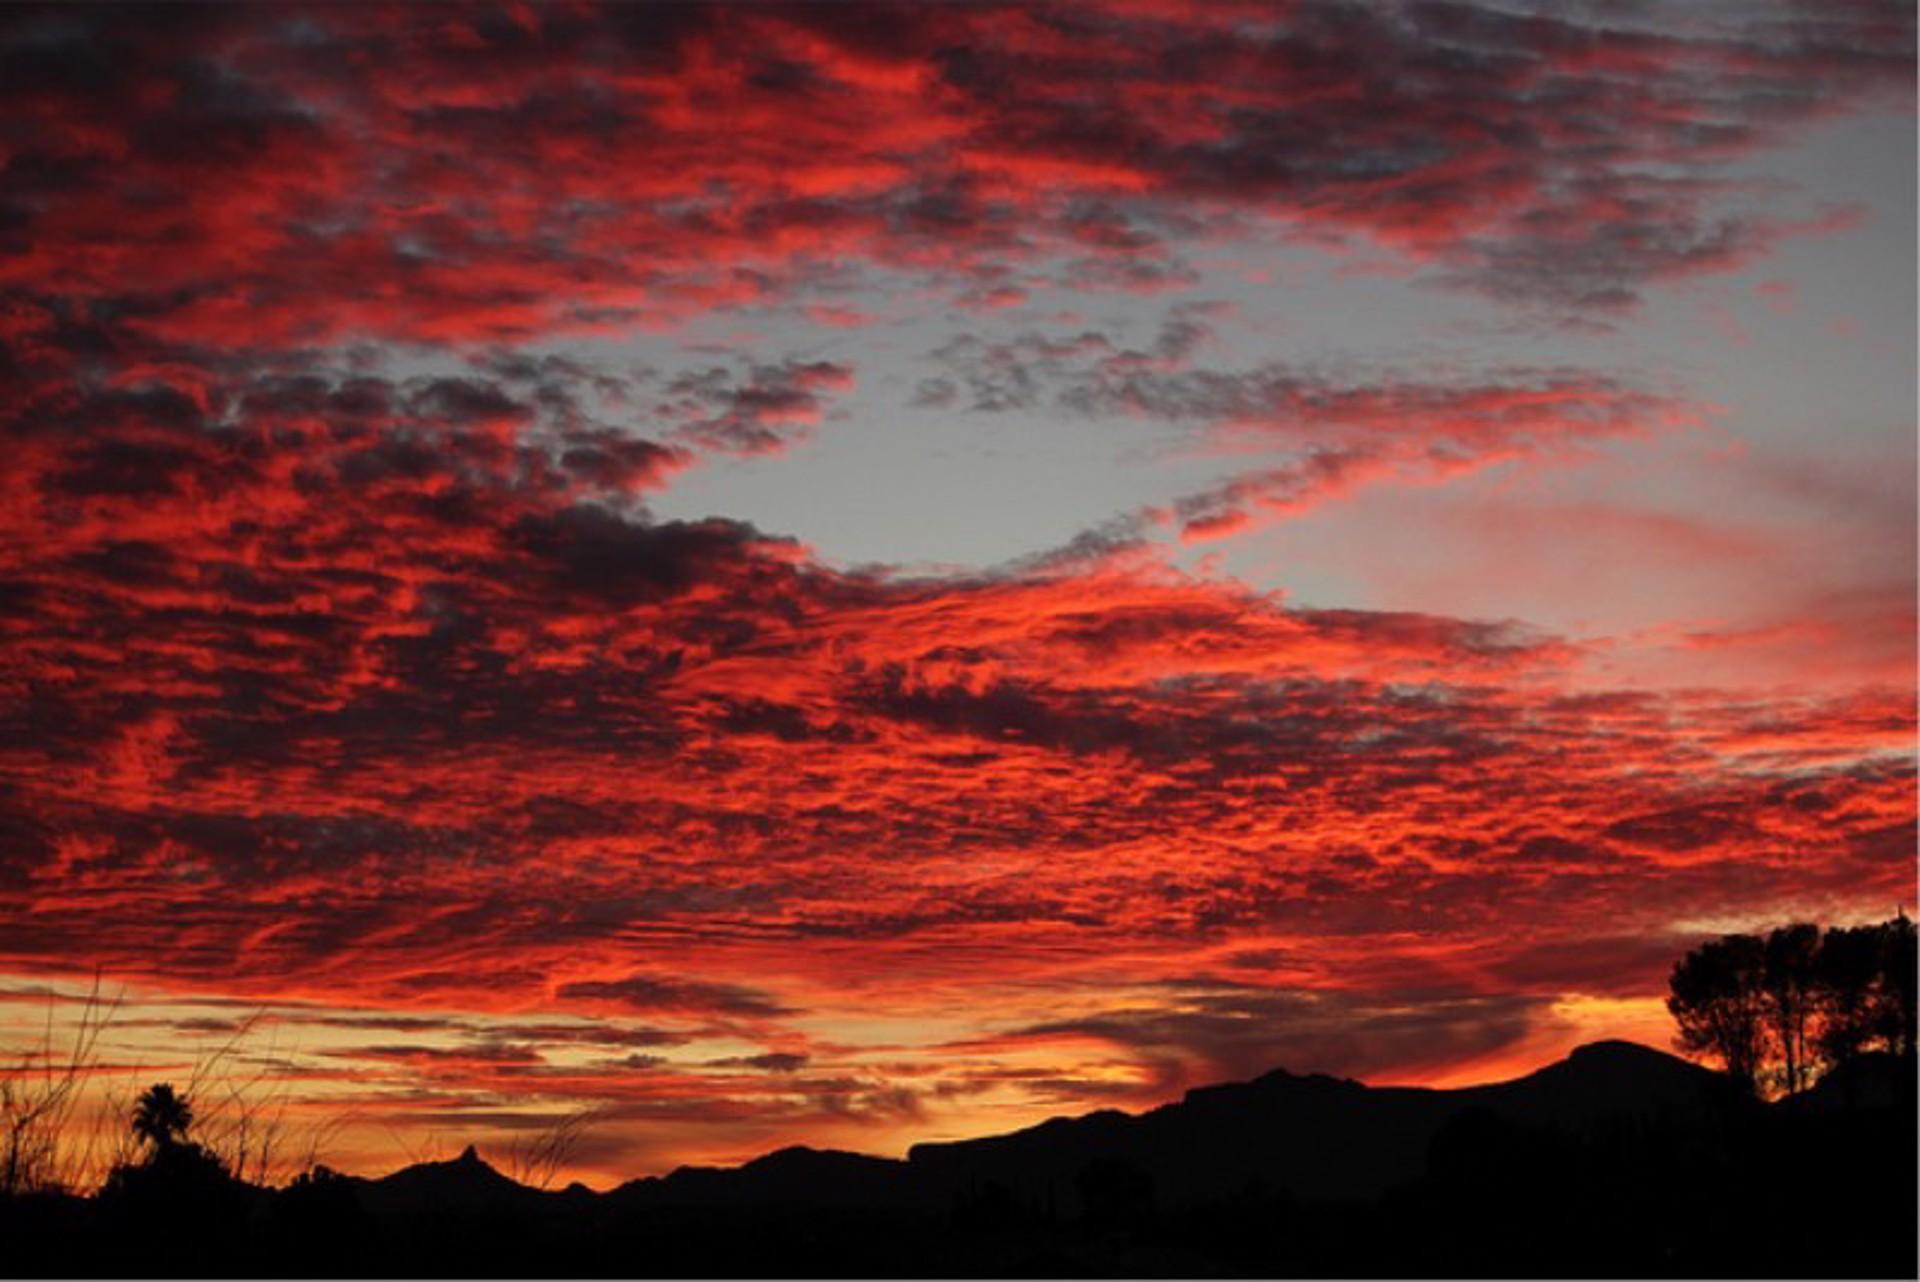 A Rio Rico Sunset by John Hays